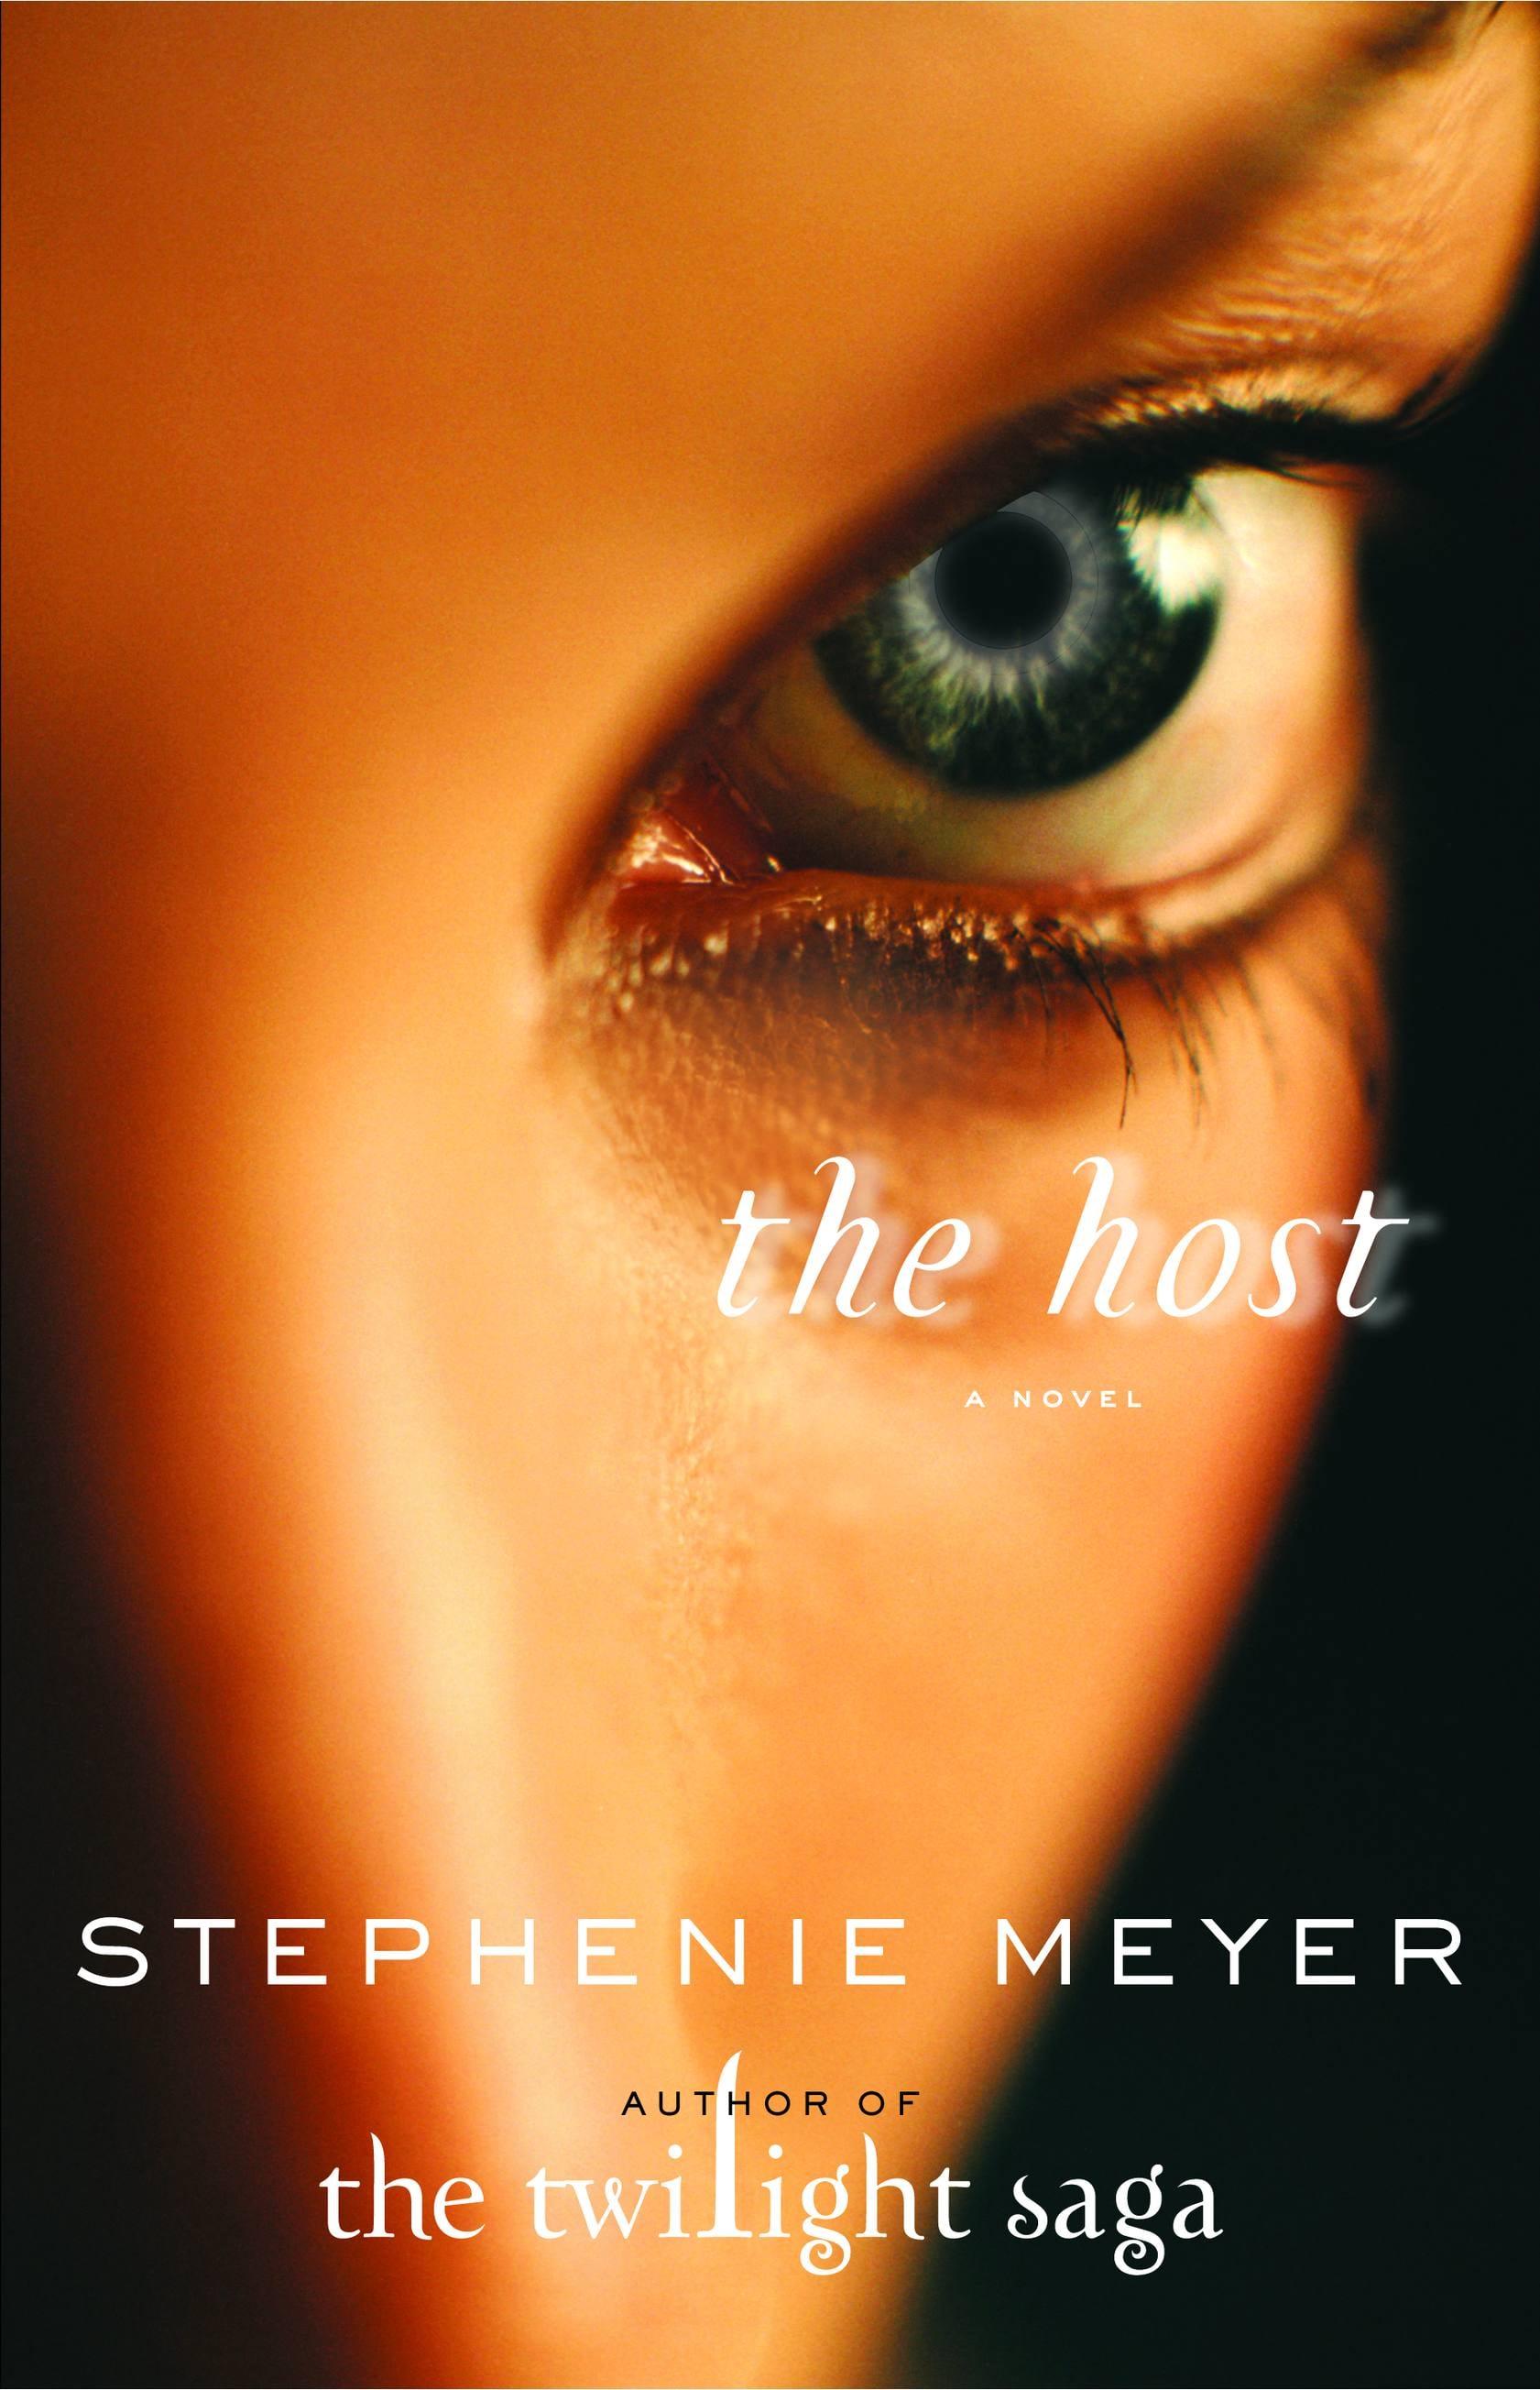 Arizona: The Host by Stephenie Meyer